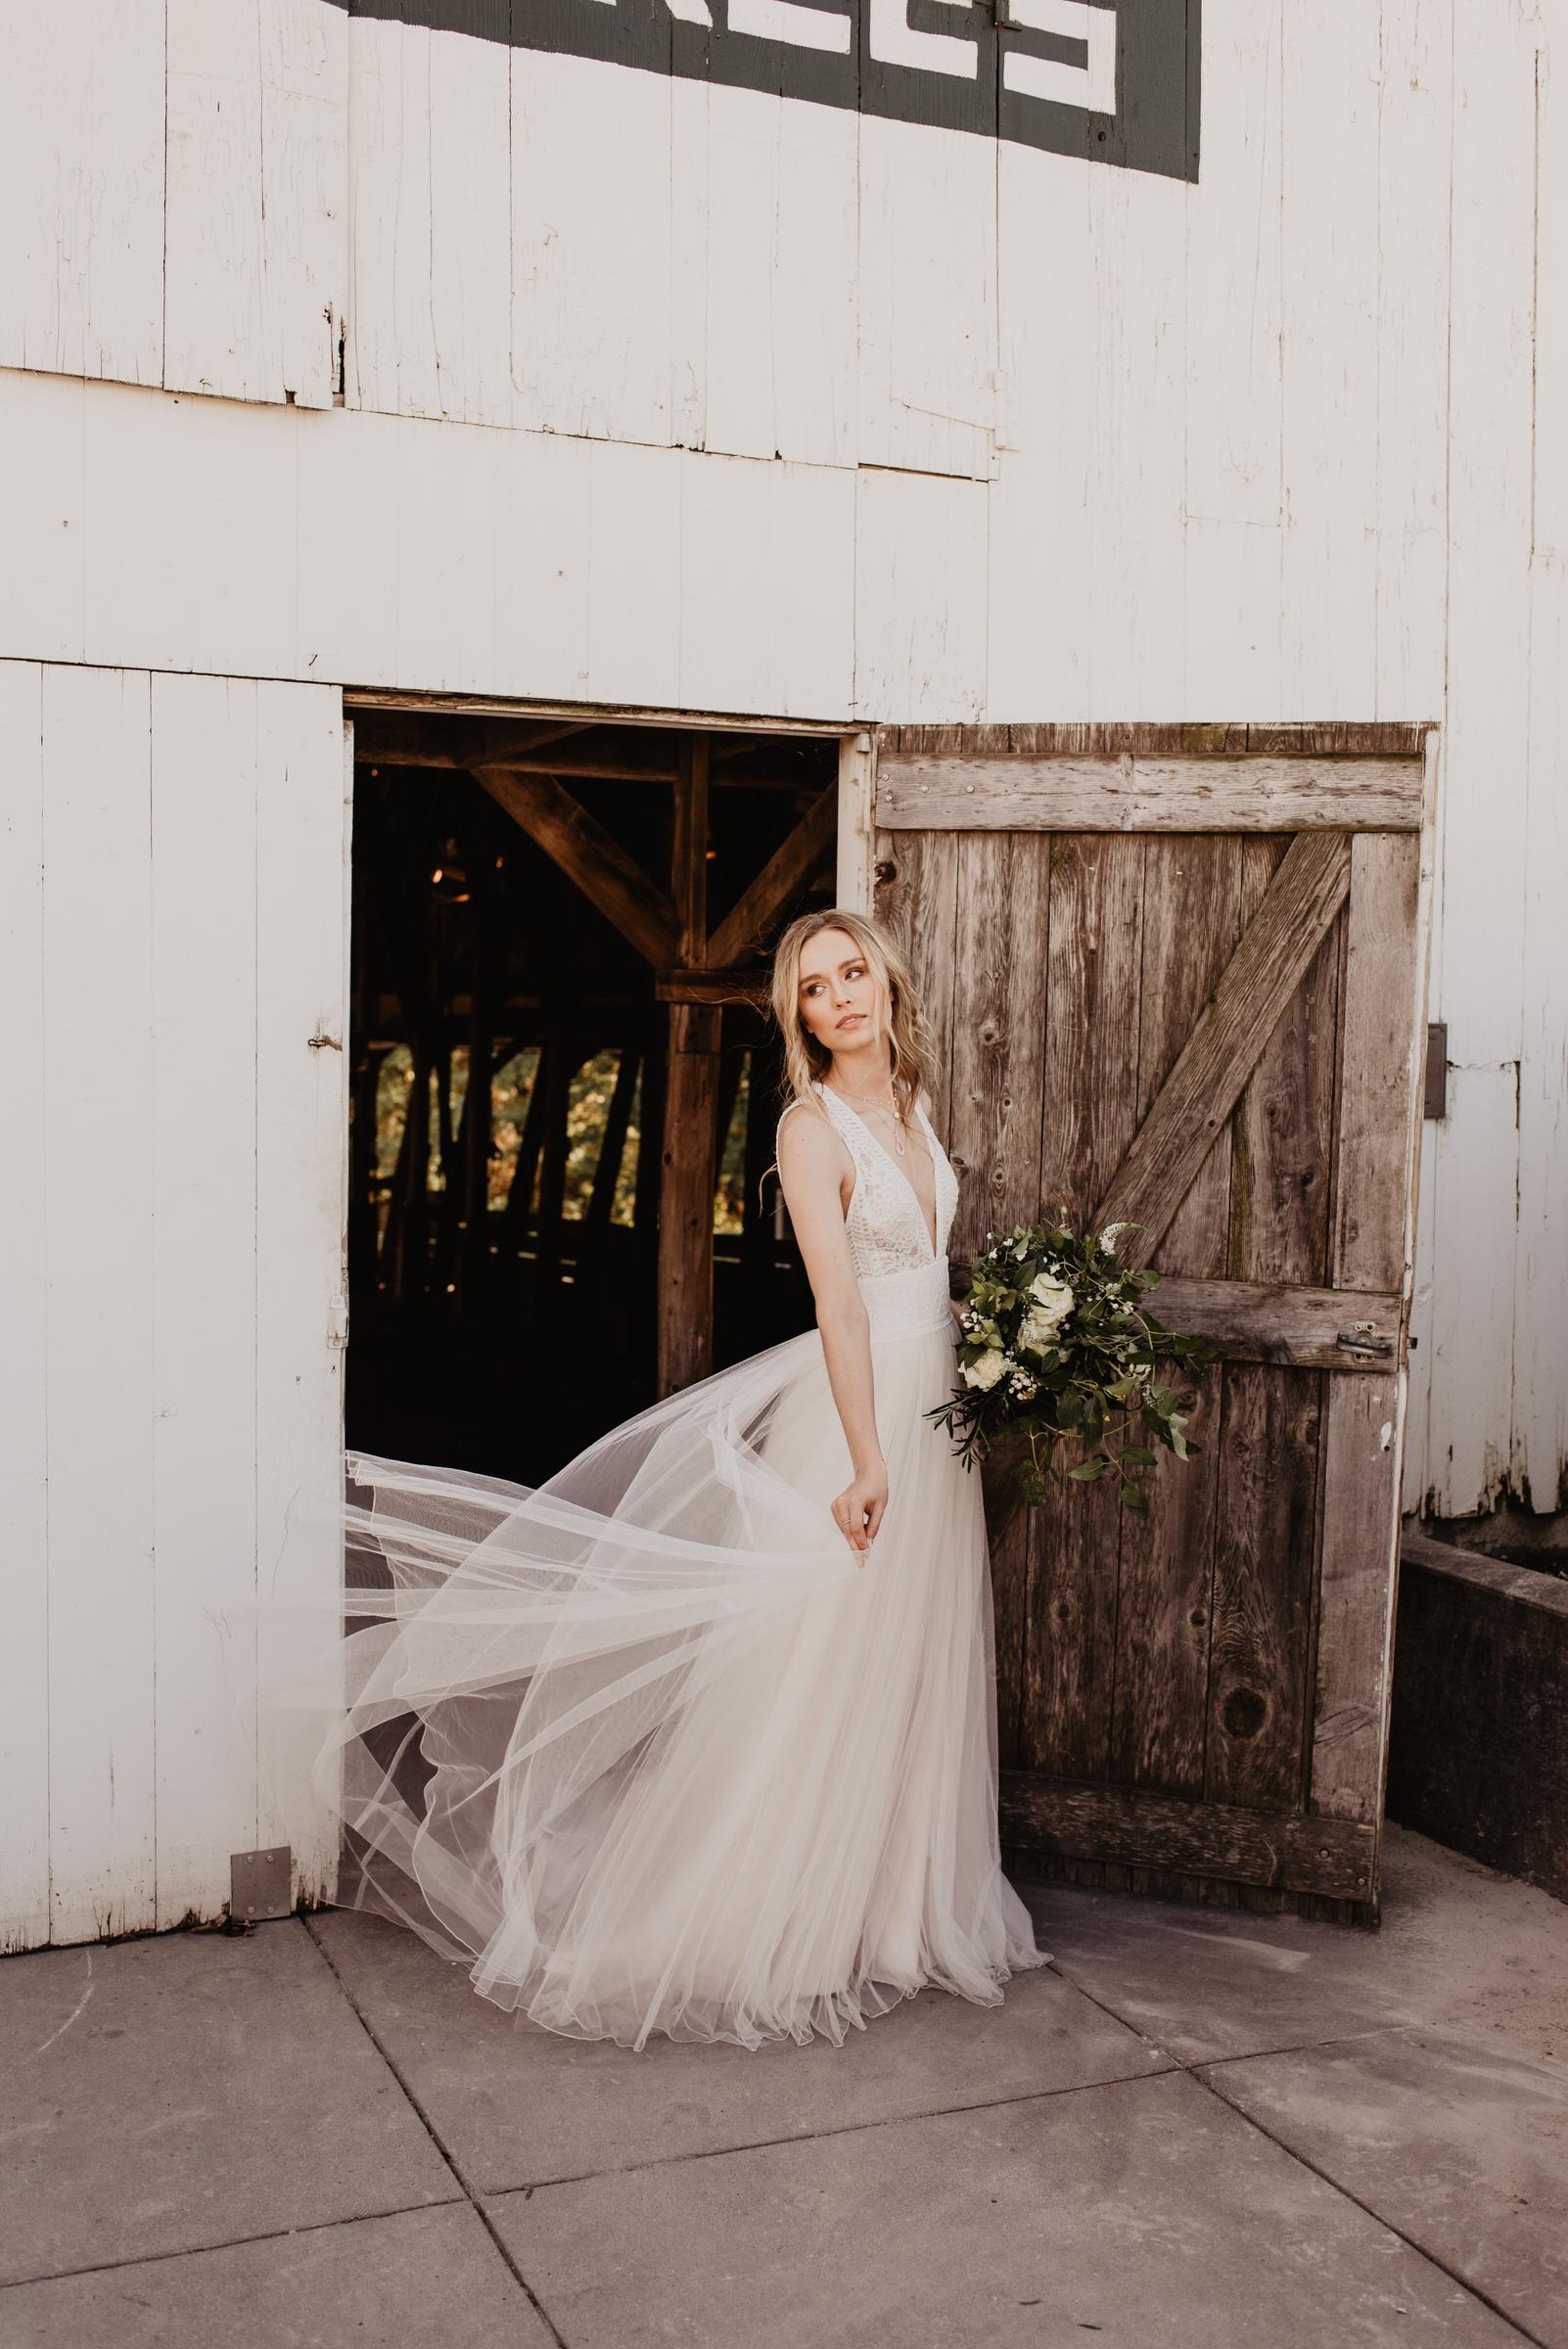 Kaylie-Sirek-Photography-NWD-SS19-11.jpg